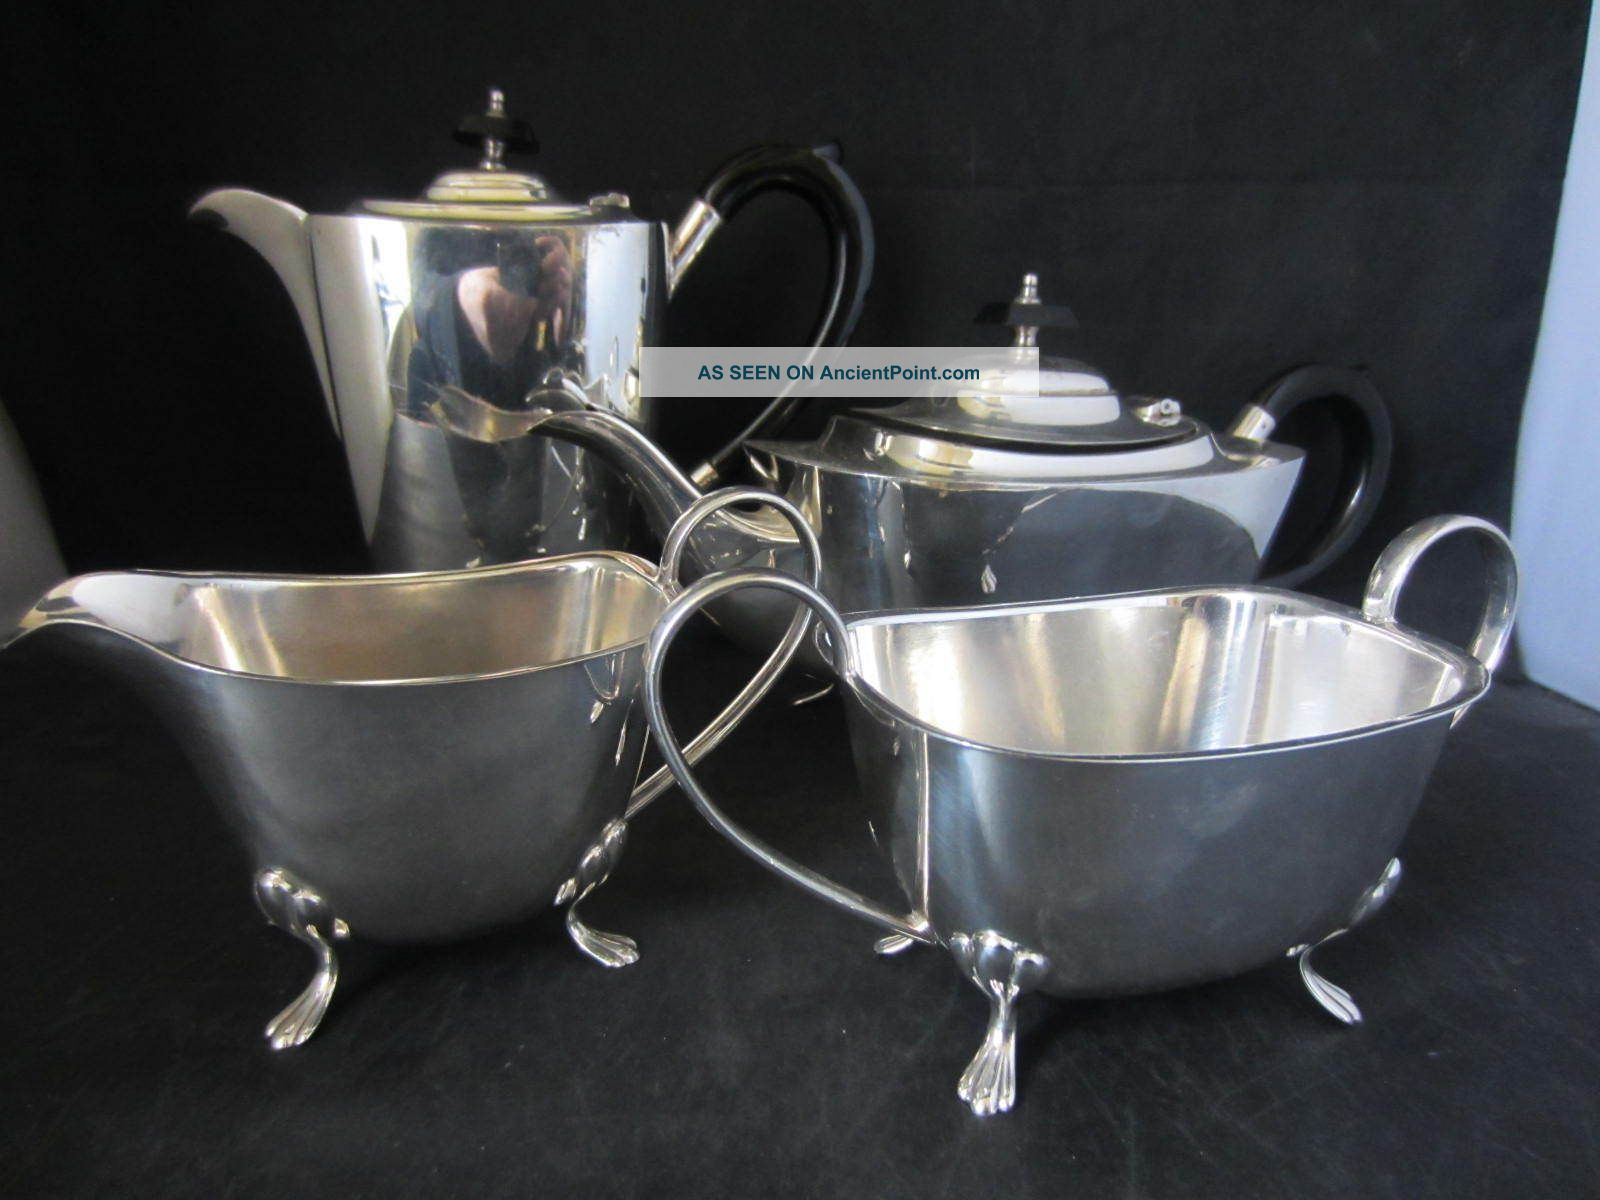 4 Piece Silver Plated Tea Set / Service - Water / Coffee Pot Teapot Jug & Bowl Tea/Coffee Pots & Sets photo